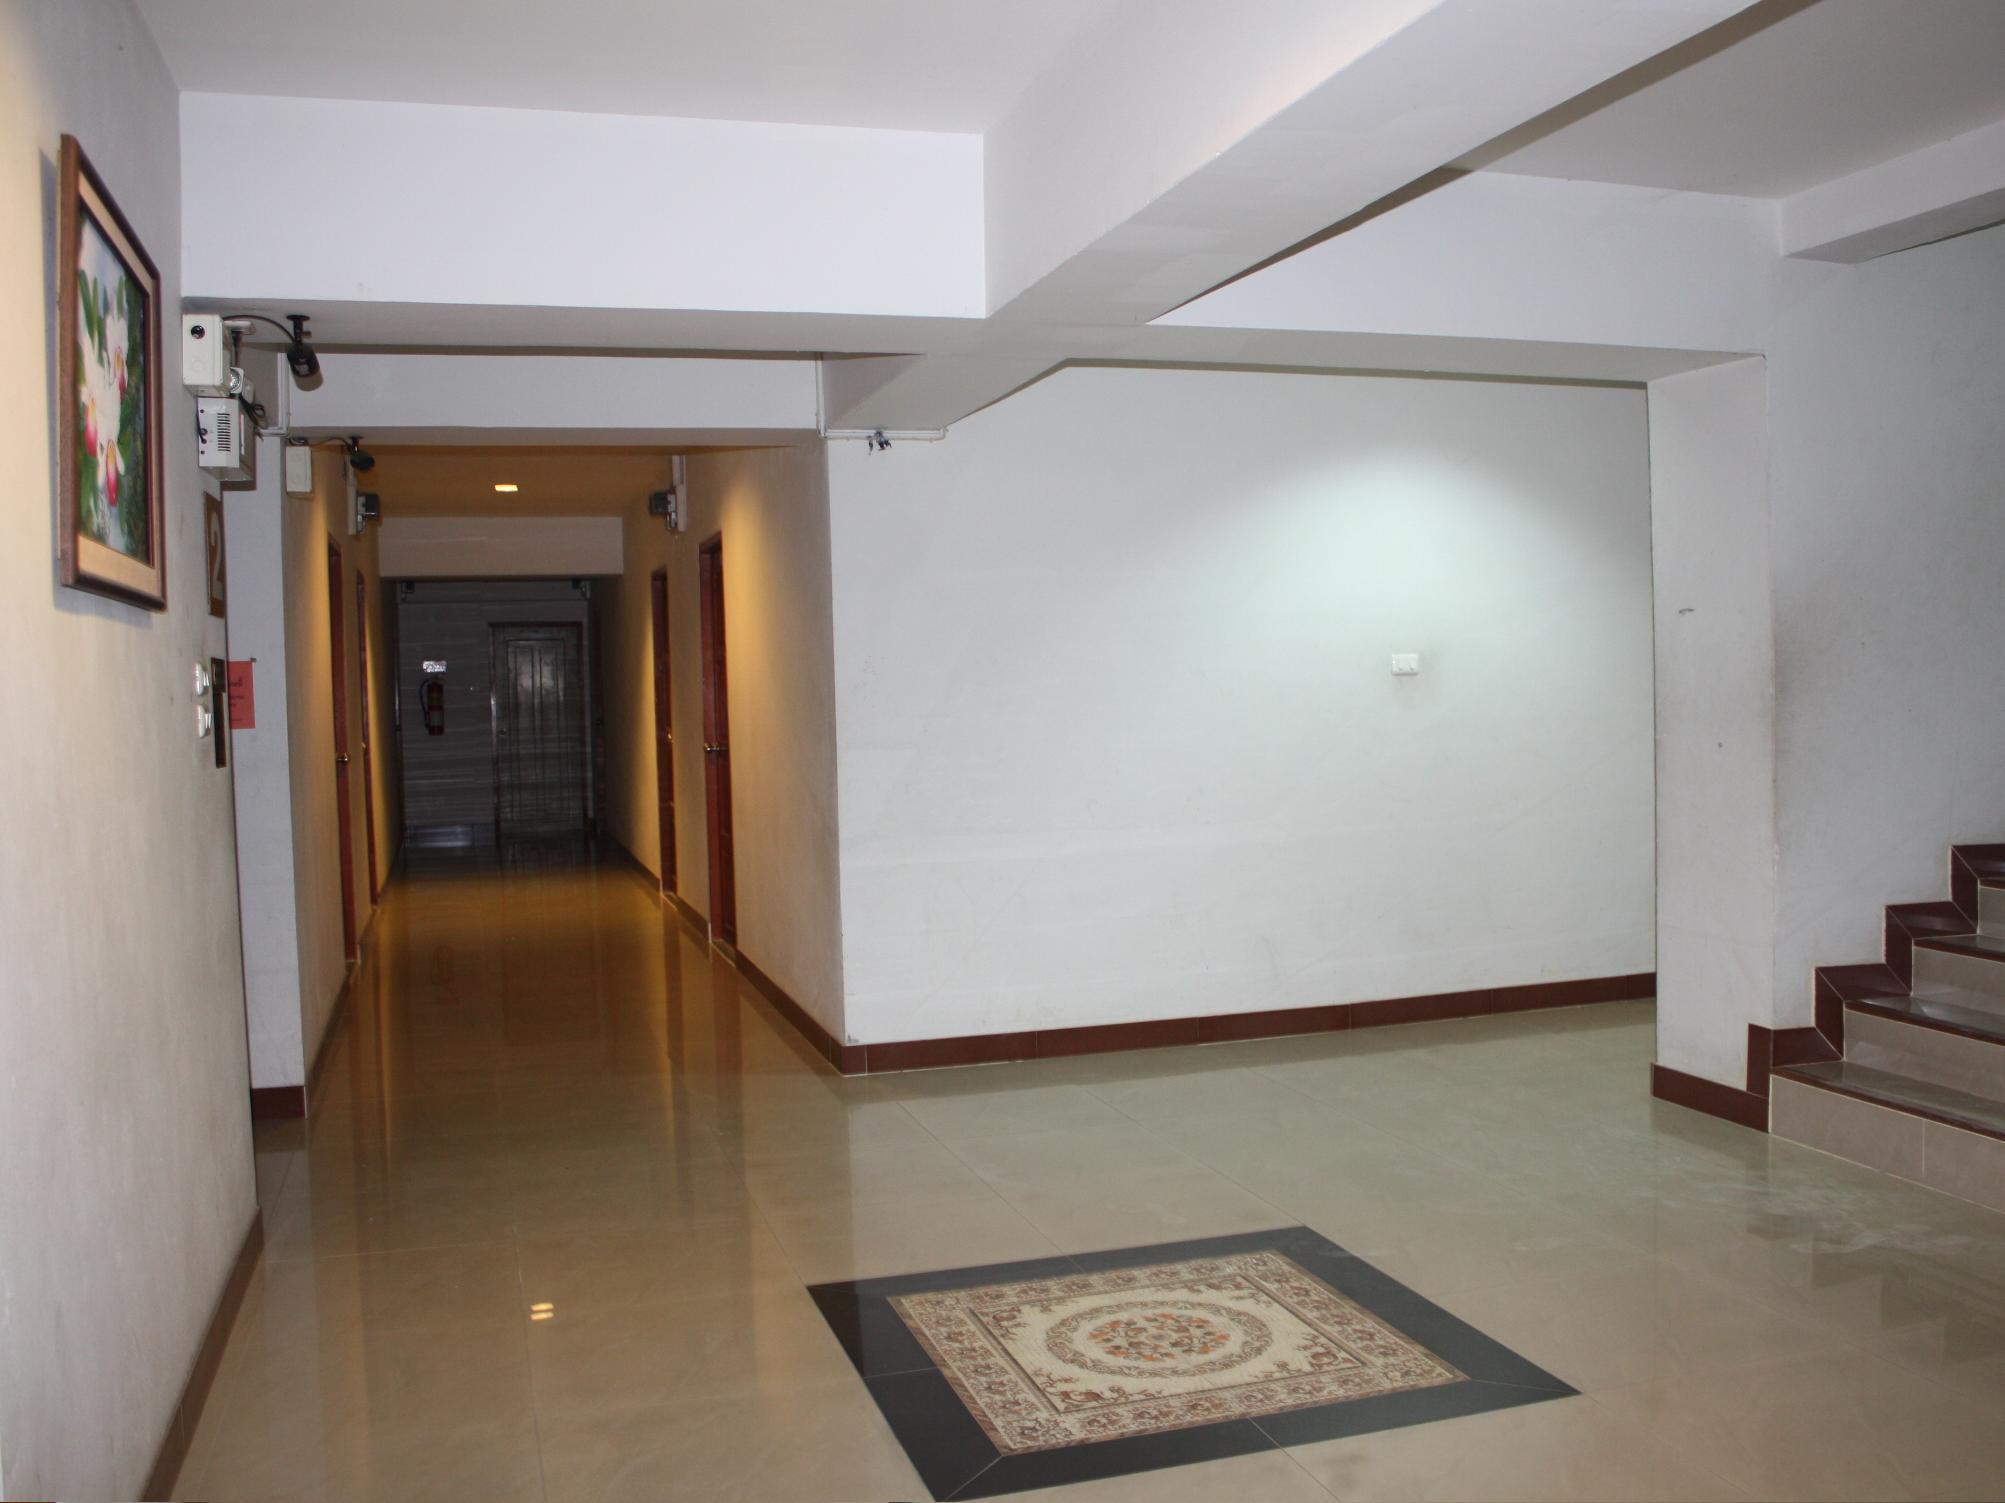 Tamarind Residences Serviced Apartment แทมารีนด์ เรสซิเดนซ์ เซอร์วิซ อพาร์ตเมนต์